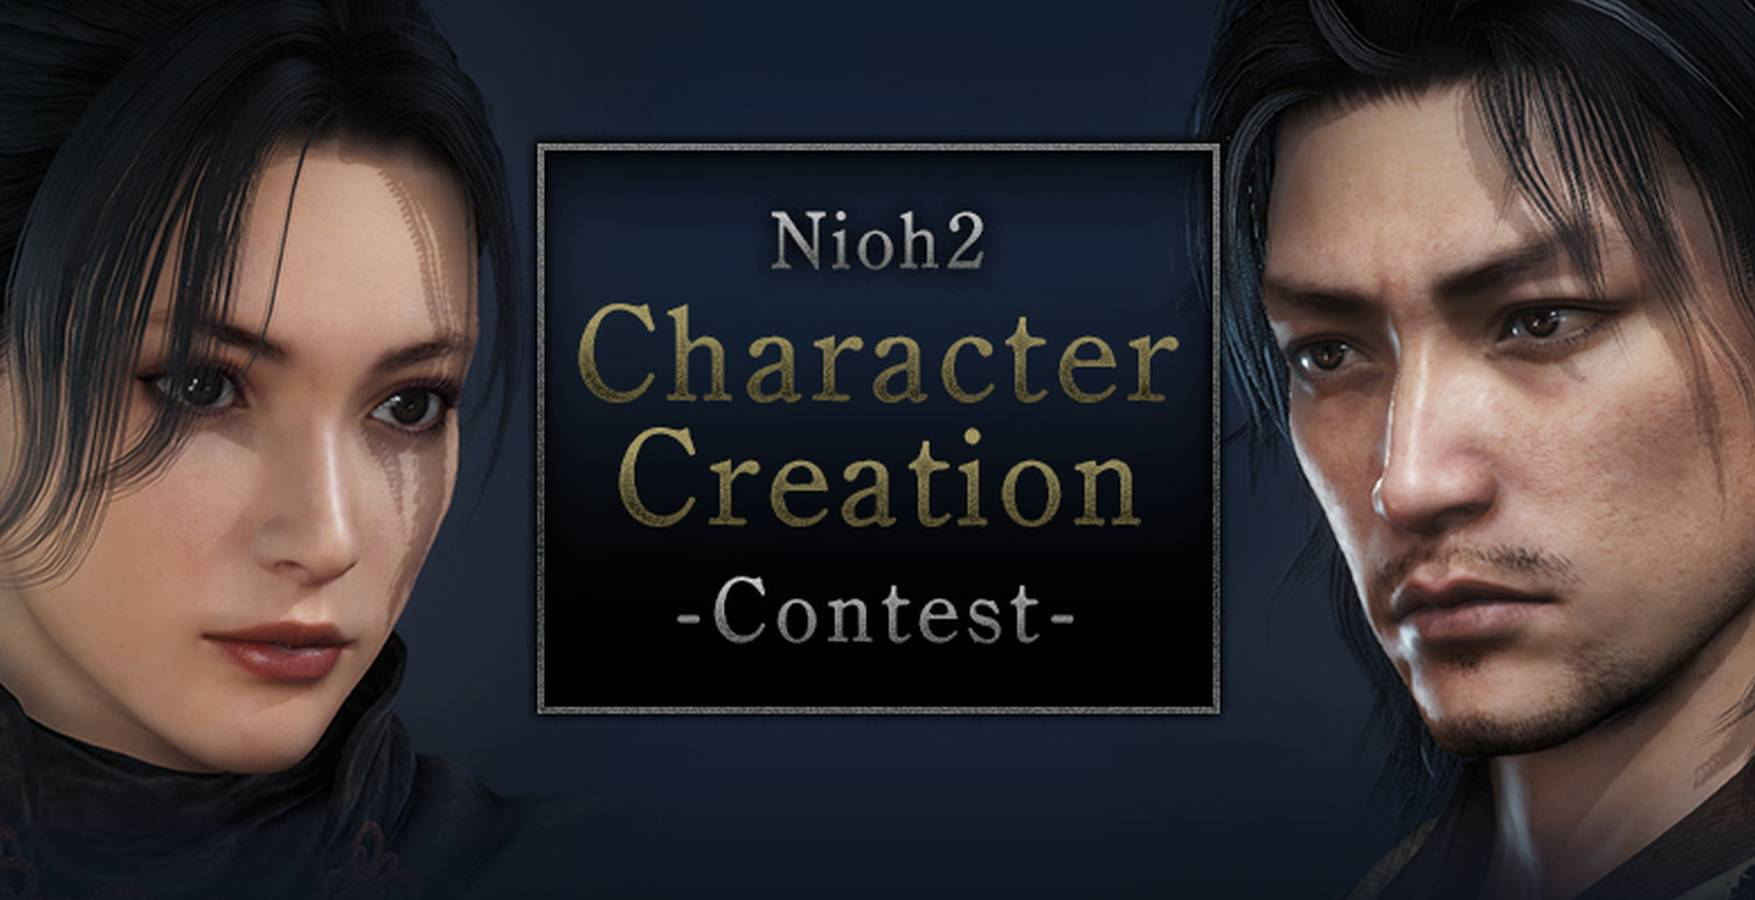 Koei Tecmo And Team Ninja Announce Nioh 2 Character Creation Contest